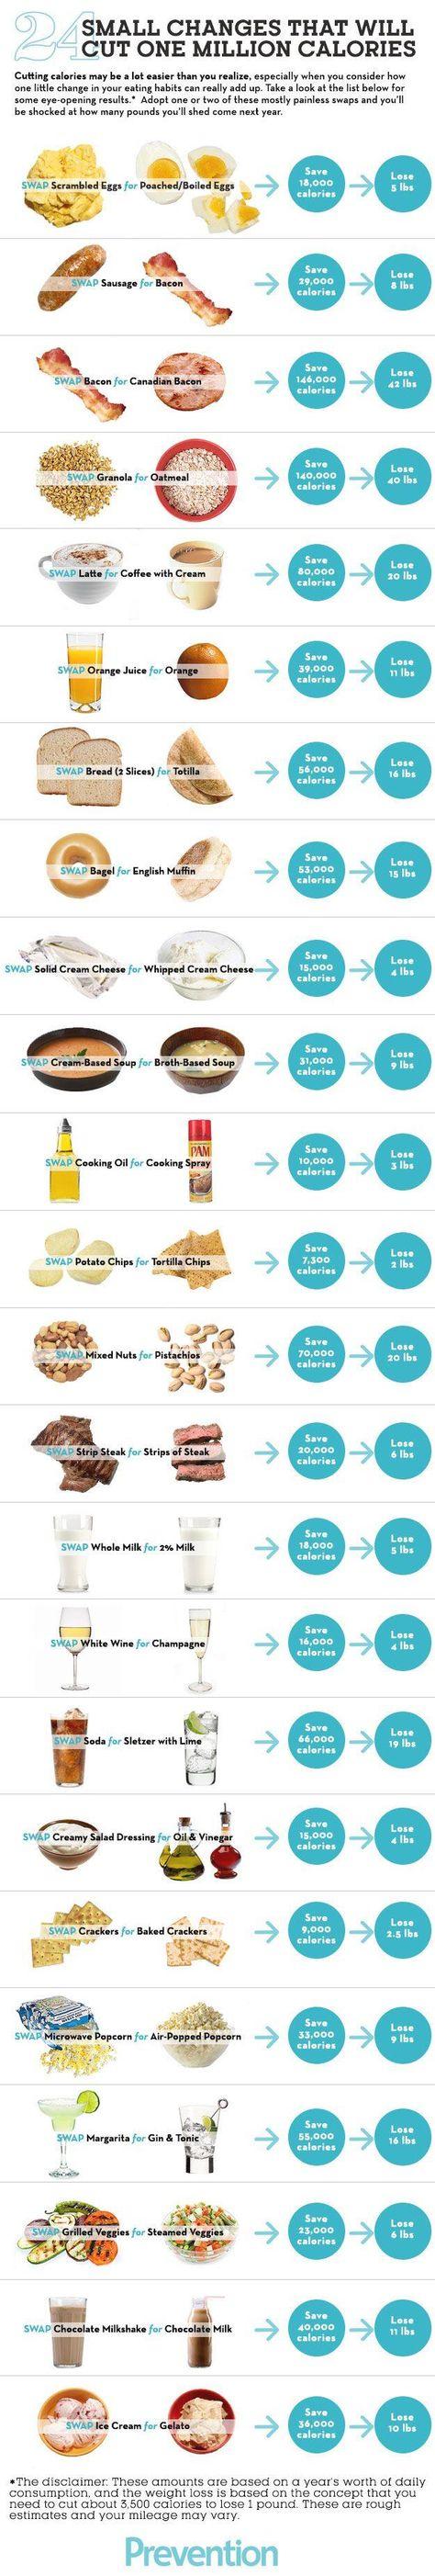 Diet Recipes Fast Metabolism